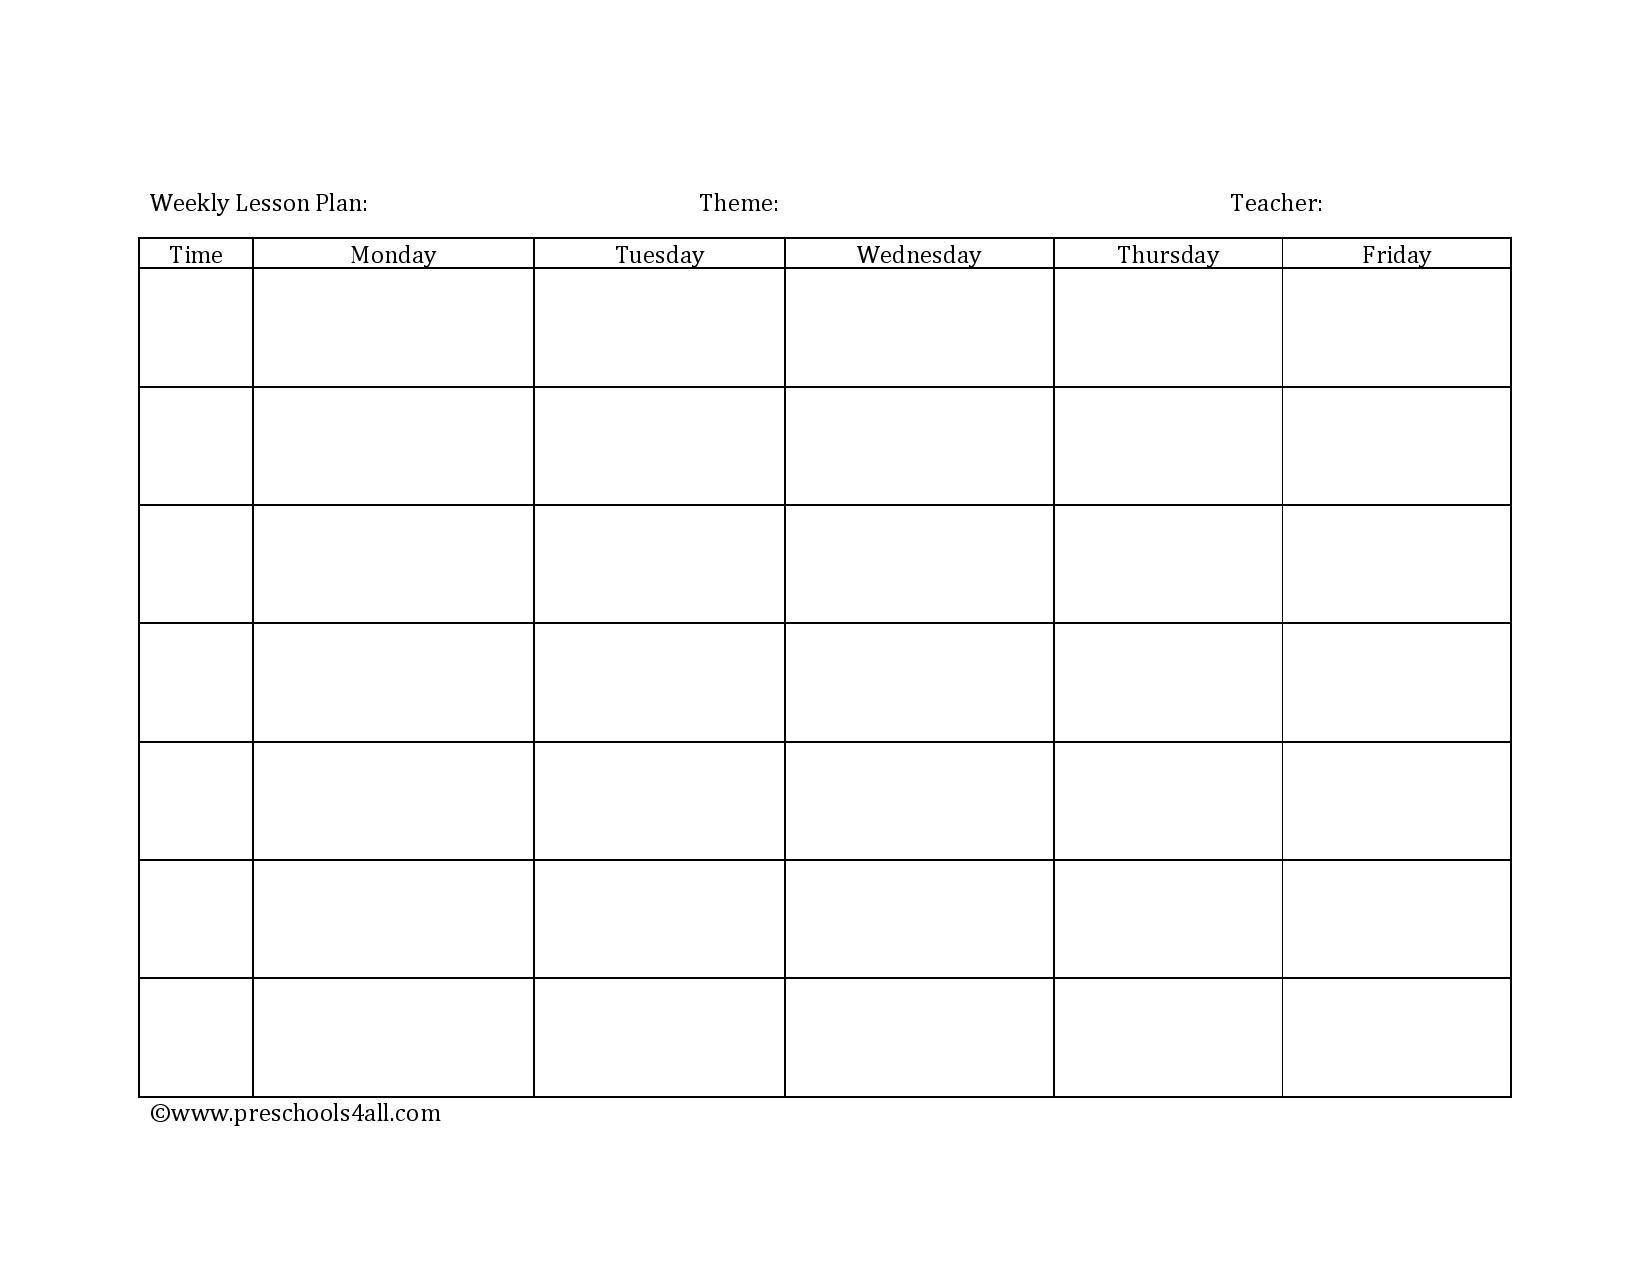 Blank Weekly Lesson Plan Template Preschool Lesson Plan Template Lesson Plan Book Template